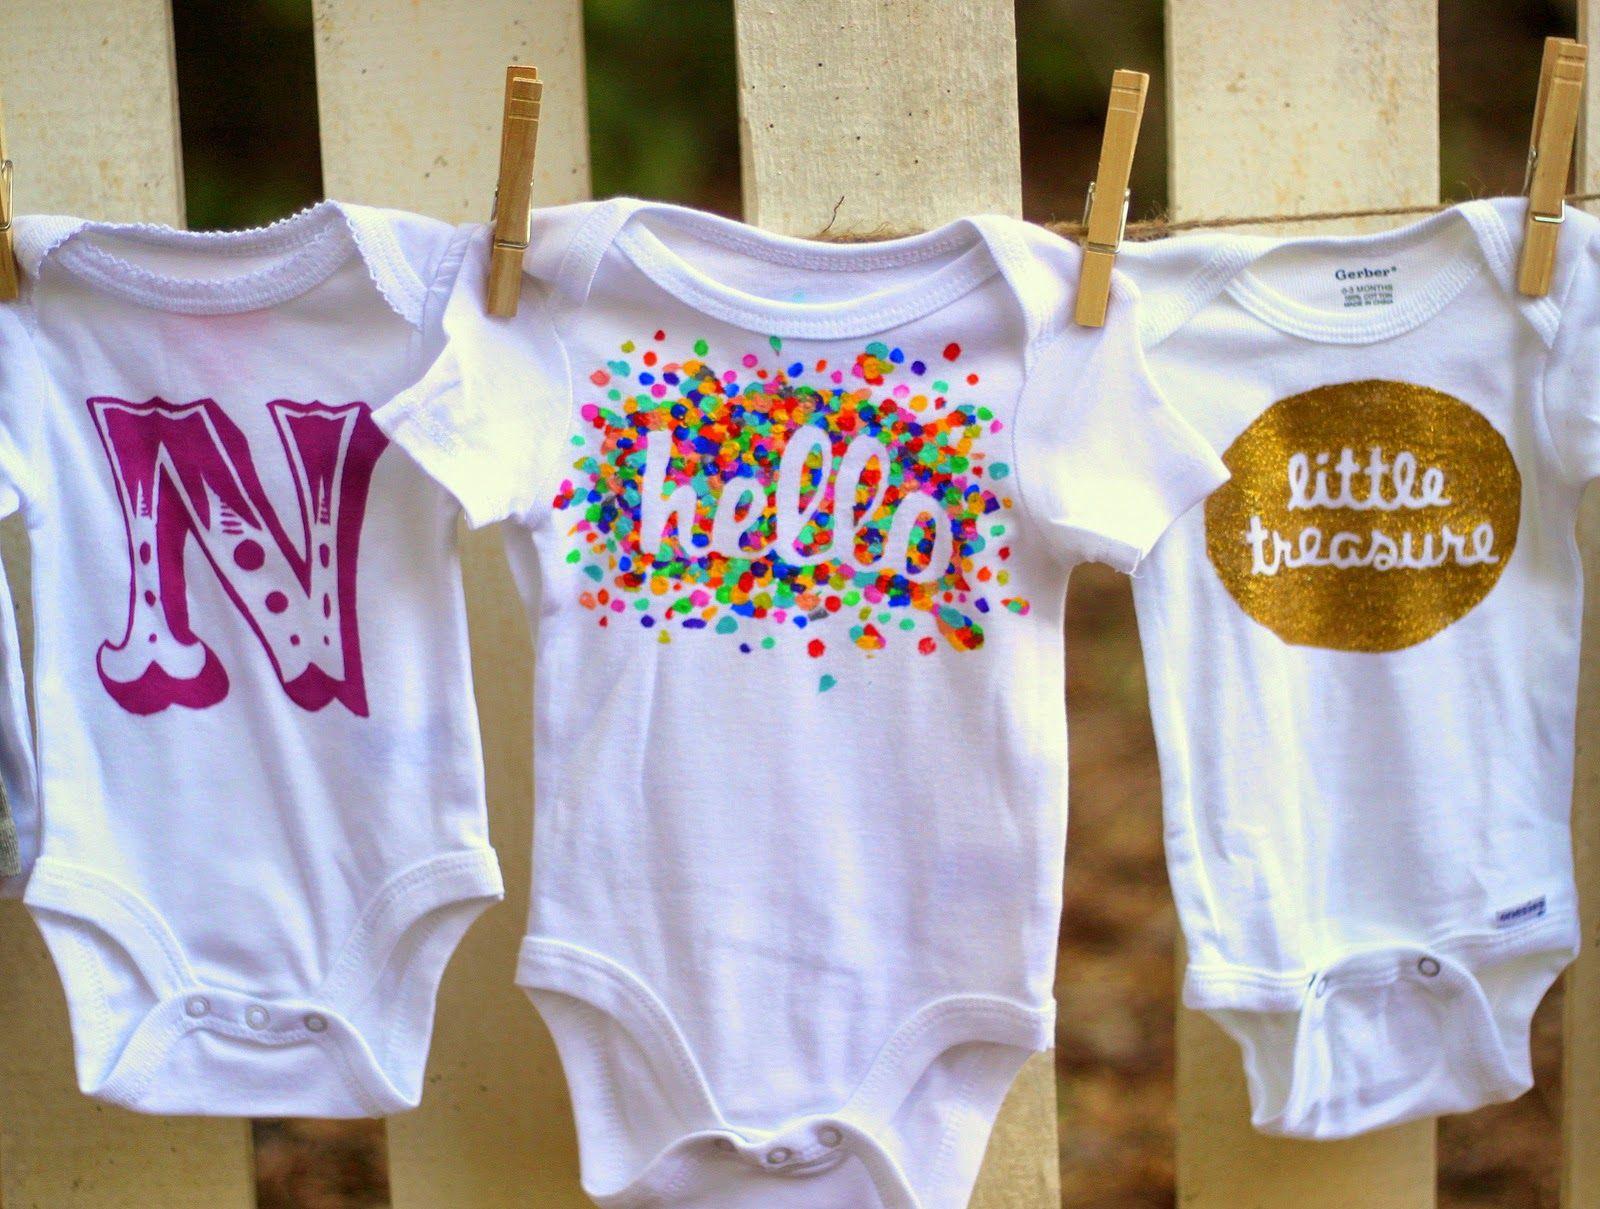 Best ideas about DIY Baby Onesies . Save or Pin 15 modern cool DIY Freezer paper stencil onesie designs Now.